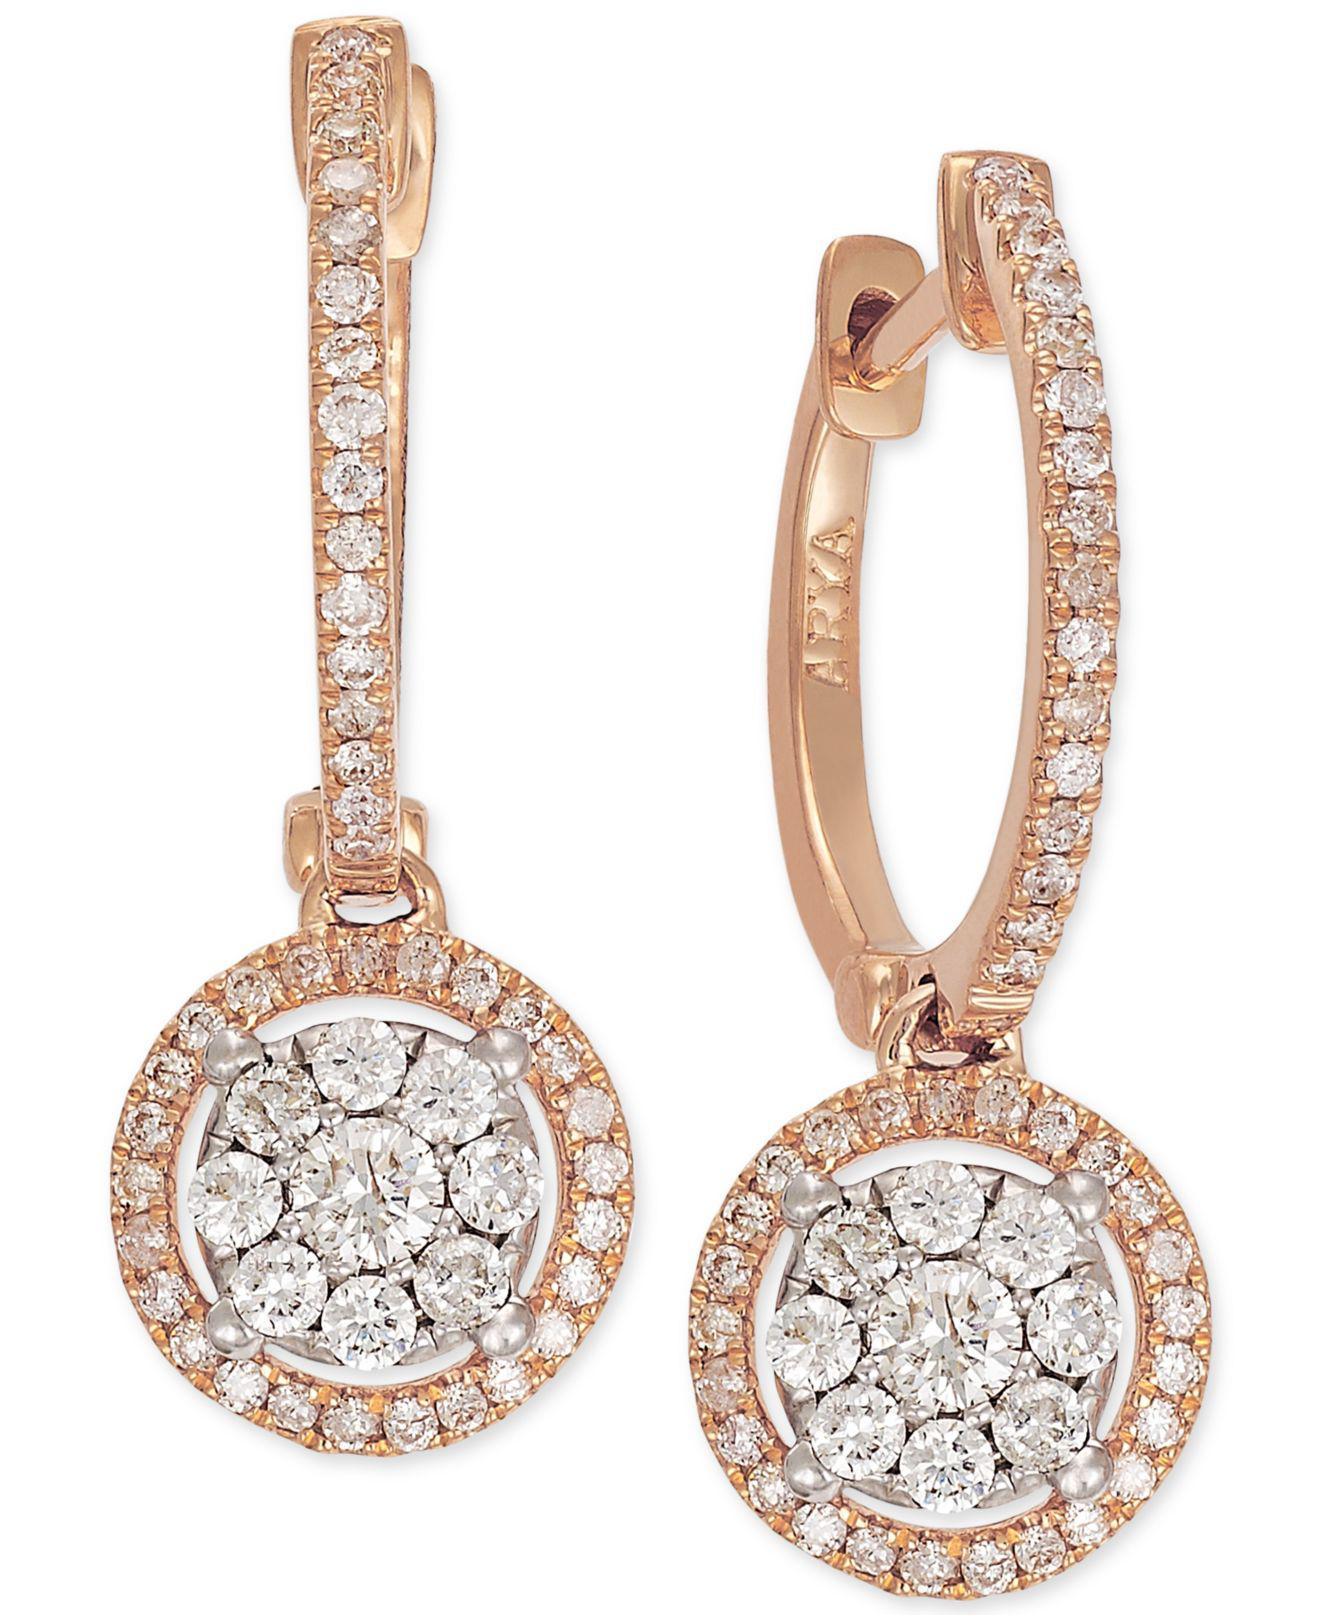 Lyst - Macy's Diamond Circle Drop Earrings In 14k Rose Gold (5/8 Ct. T.w.) in Metallic